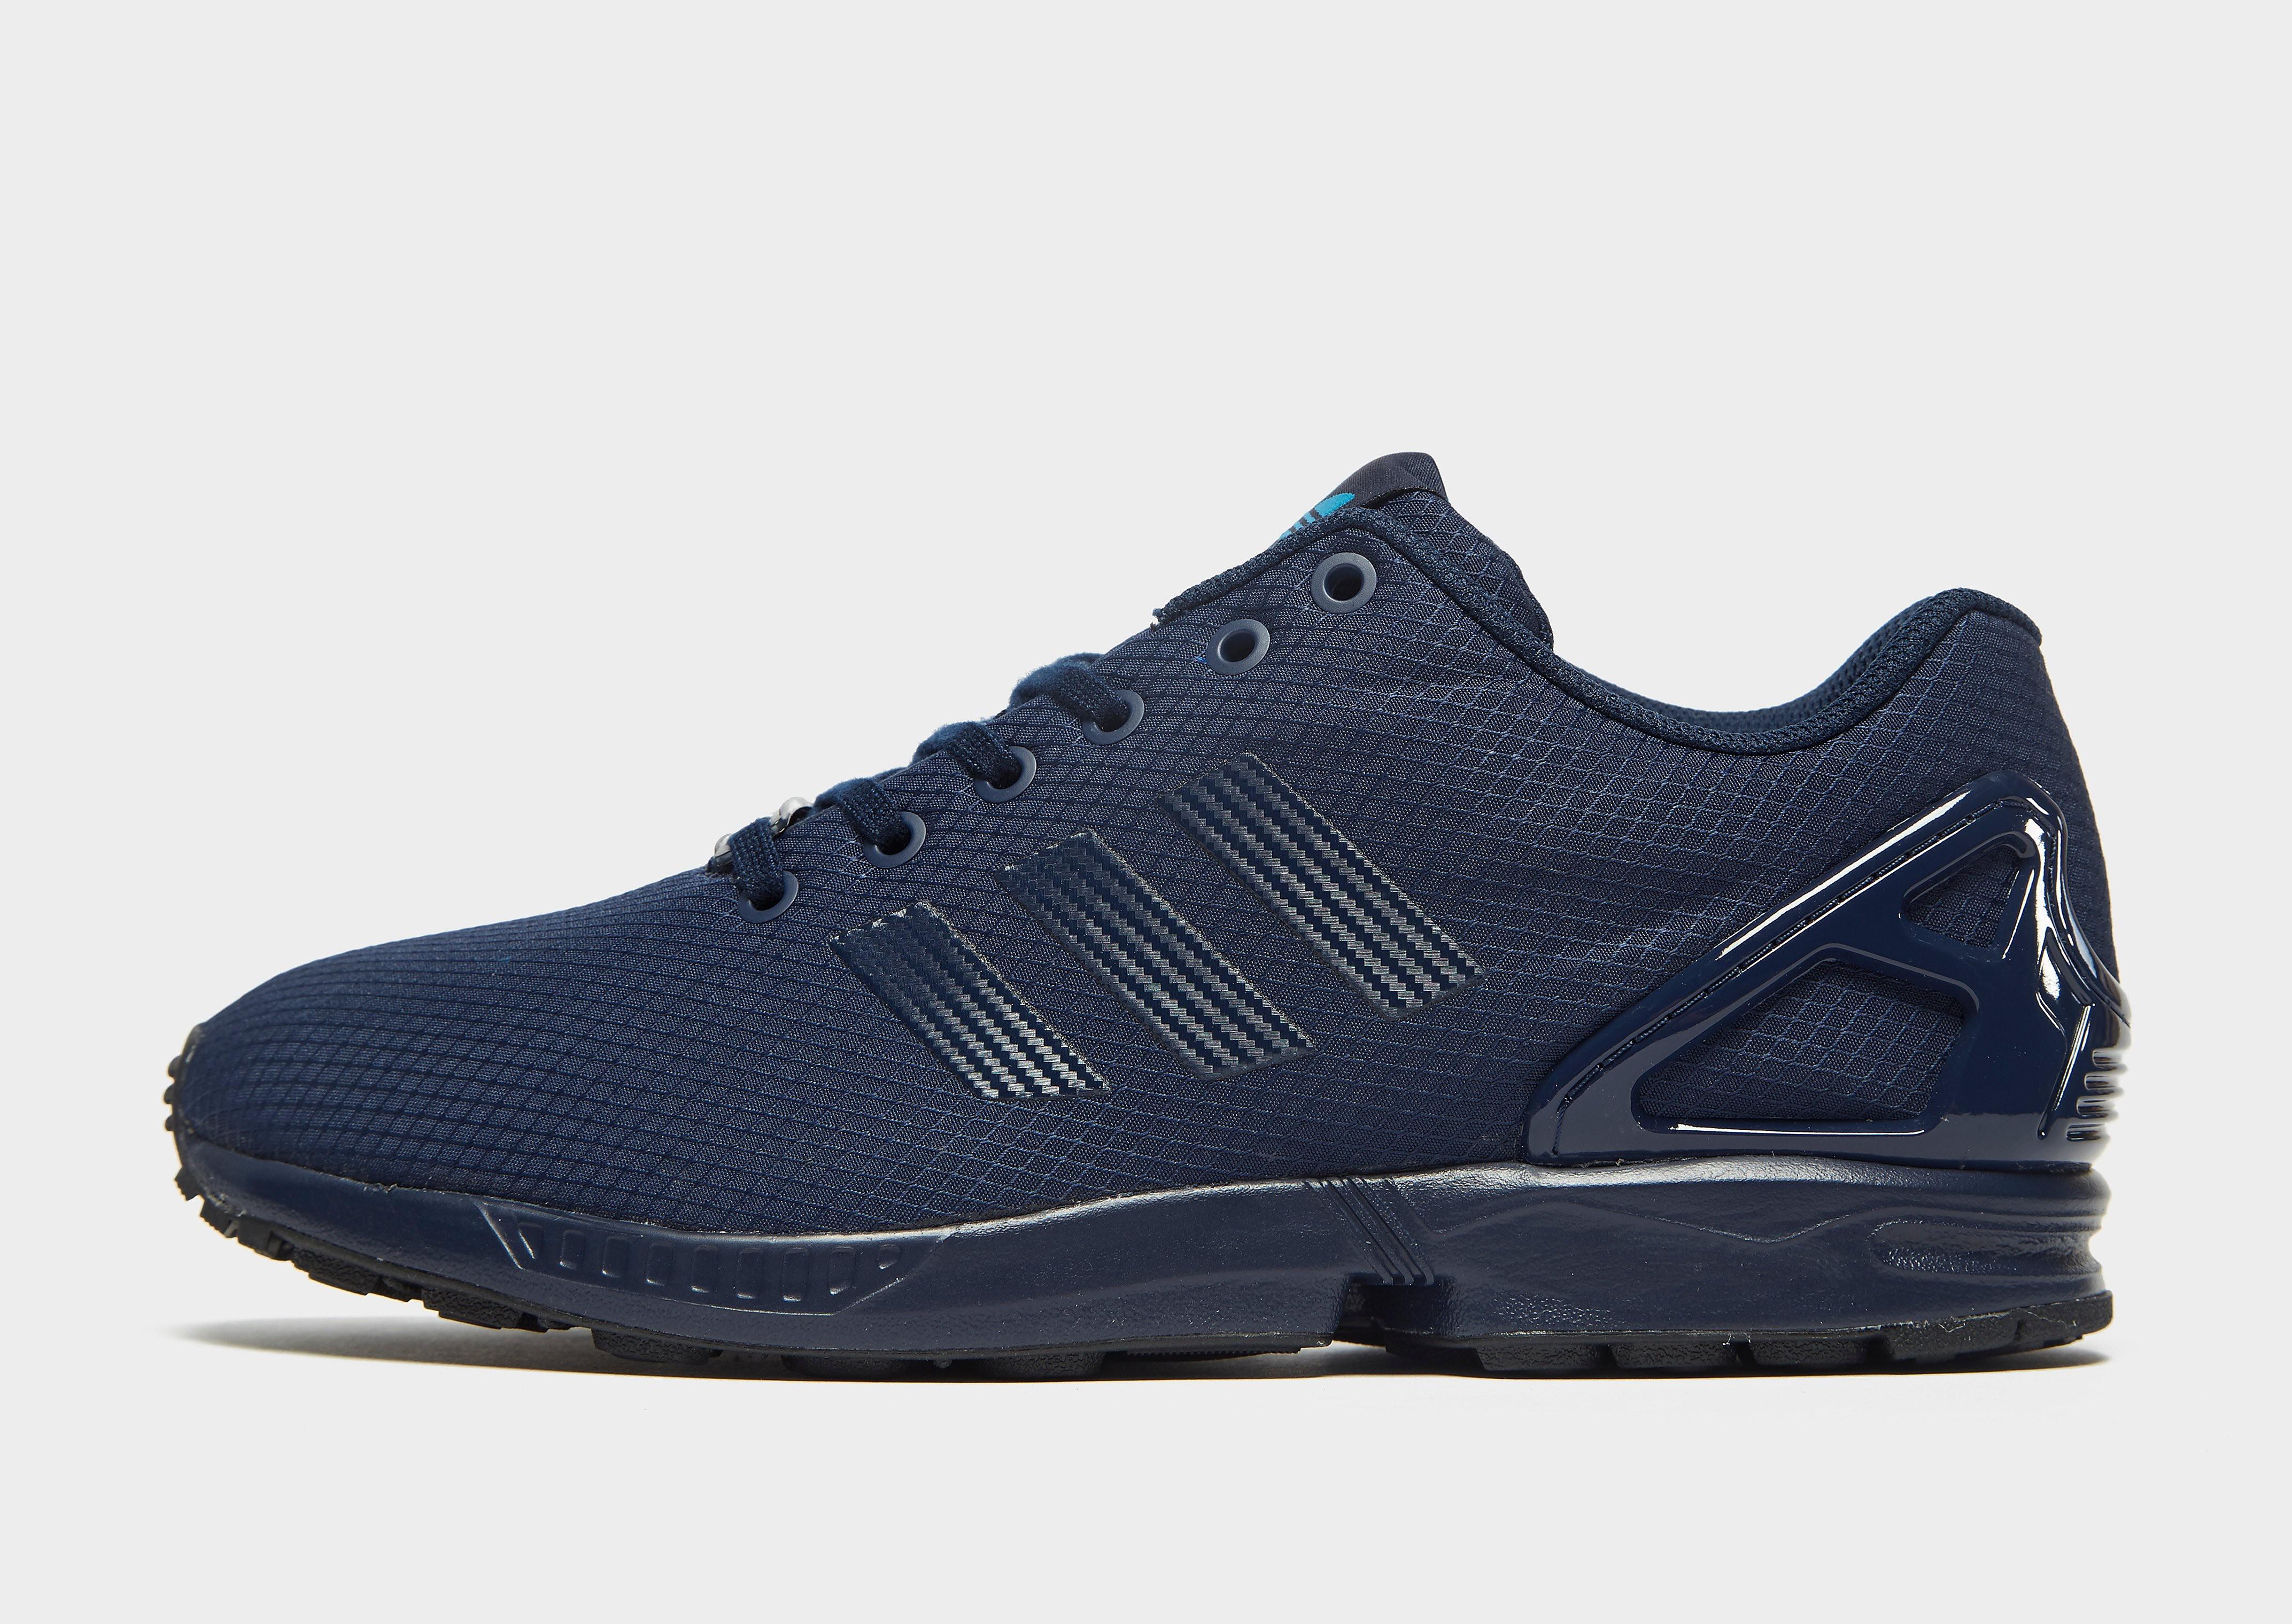 Adidas ZX Flux herensneaker blauw